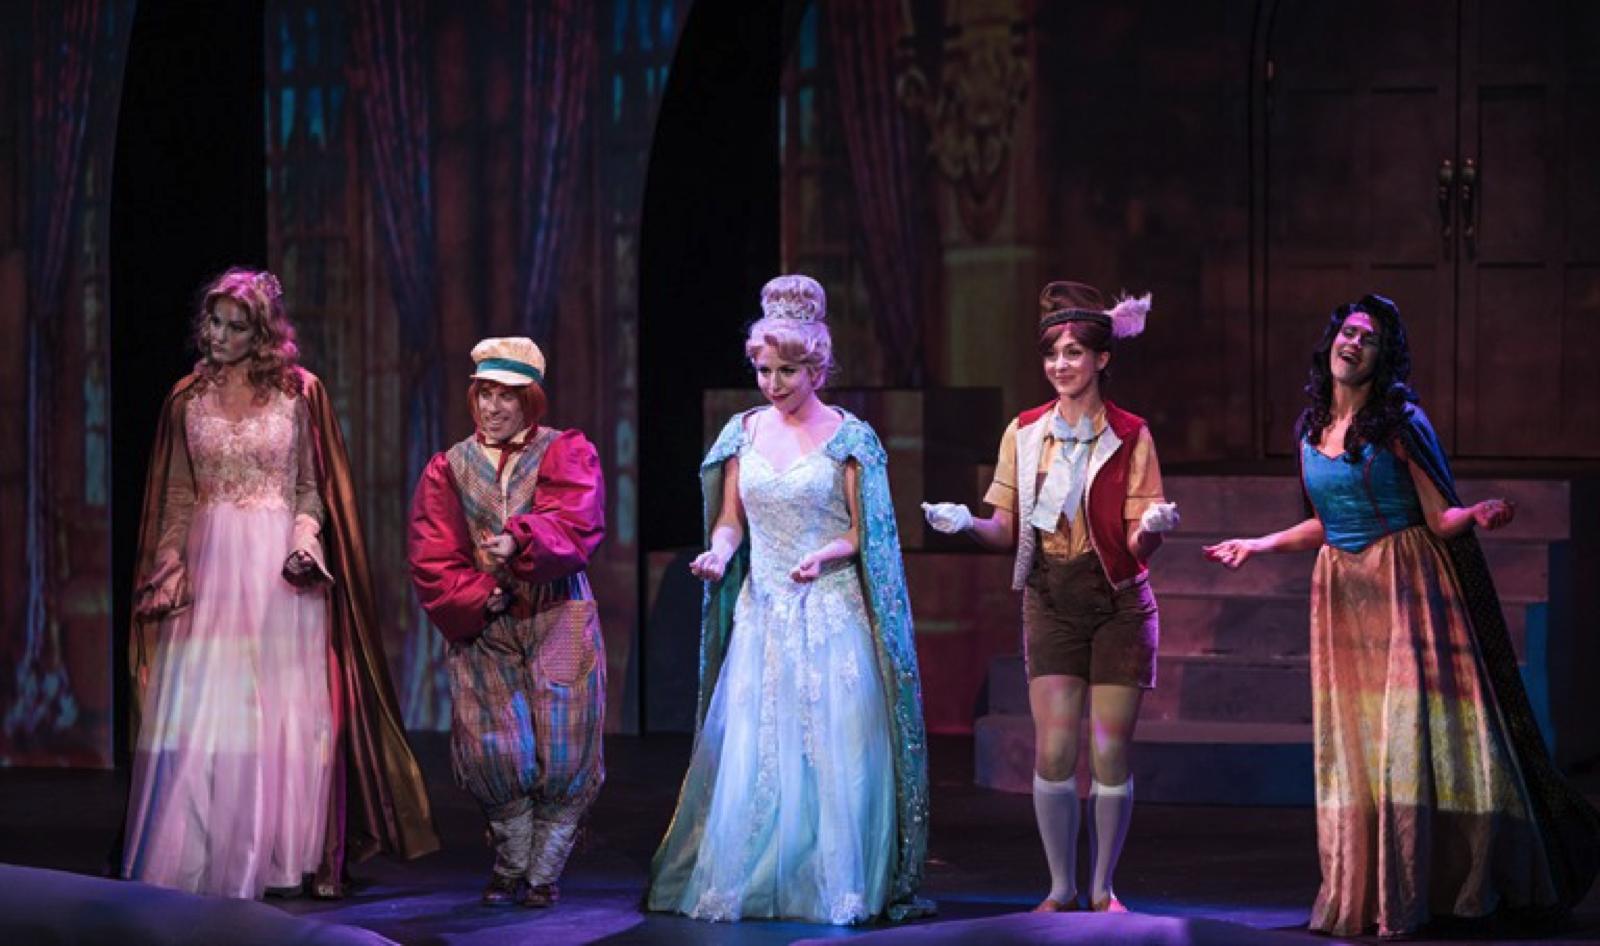 Jennifer Byrne as Sleeping Beauty, Jordan Aragon as Jack, Hannah Record as Cinderella, Courtney Capek as Pinocchio, and Aléna Watters as Snow White. Photo courtesy of Tuacahn.